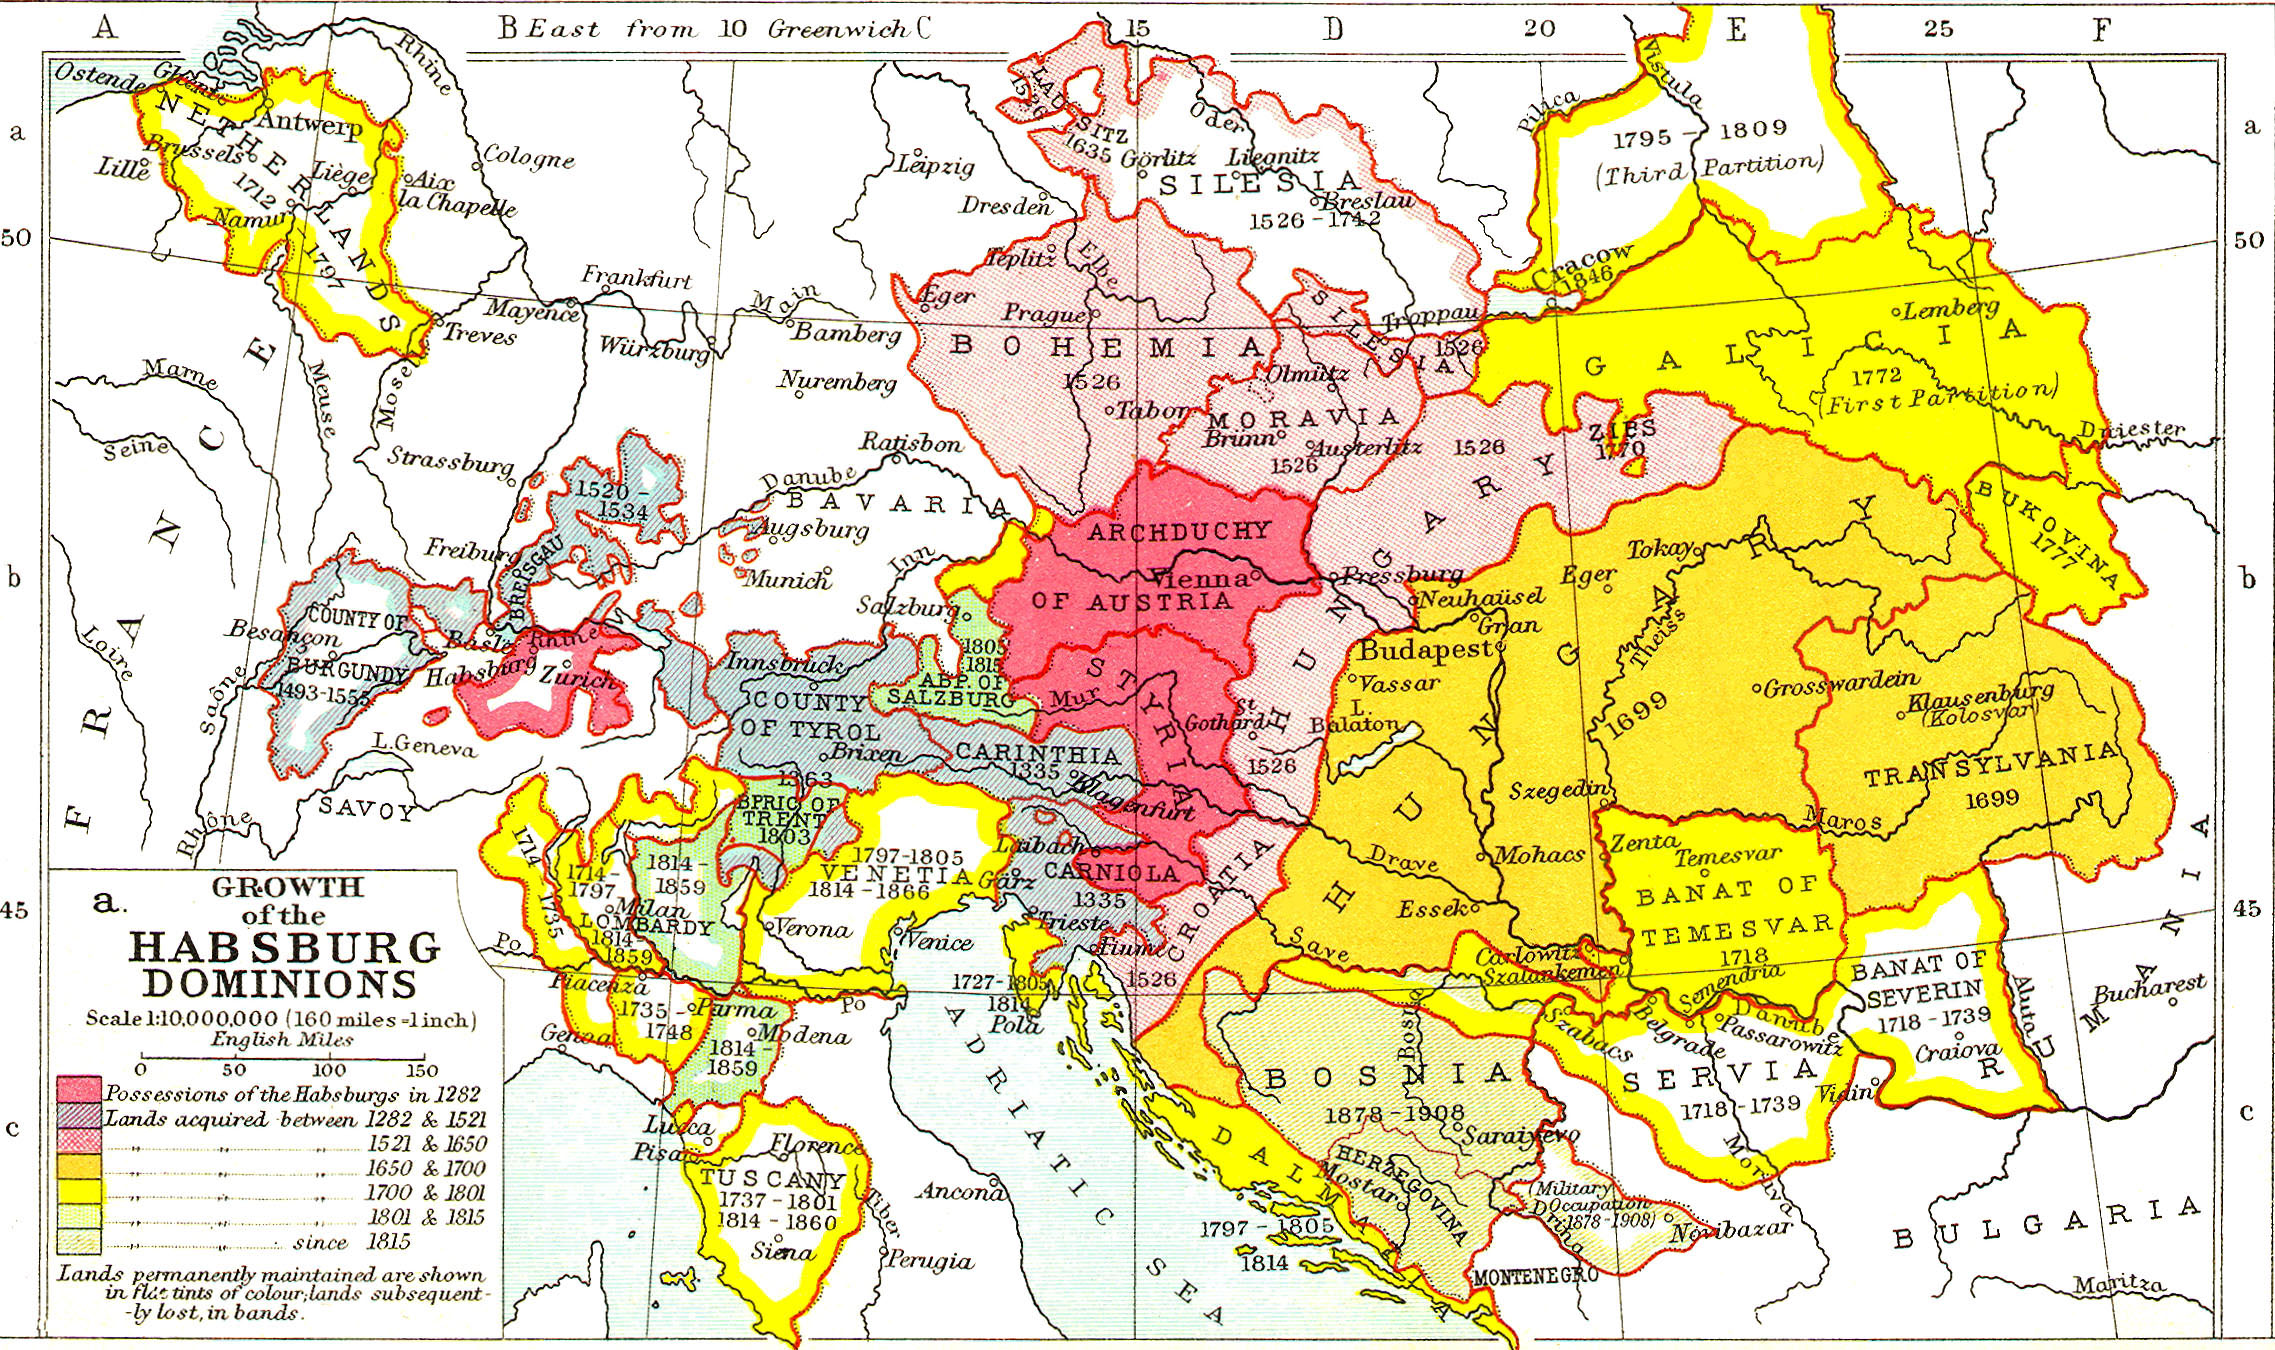 https://i2.wp.com/upload.wikimedia.org/wikipedia/commons/8/8e/Growth_of_Habsburg_territories.jpg